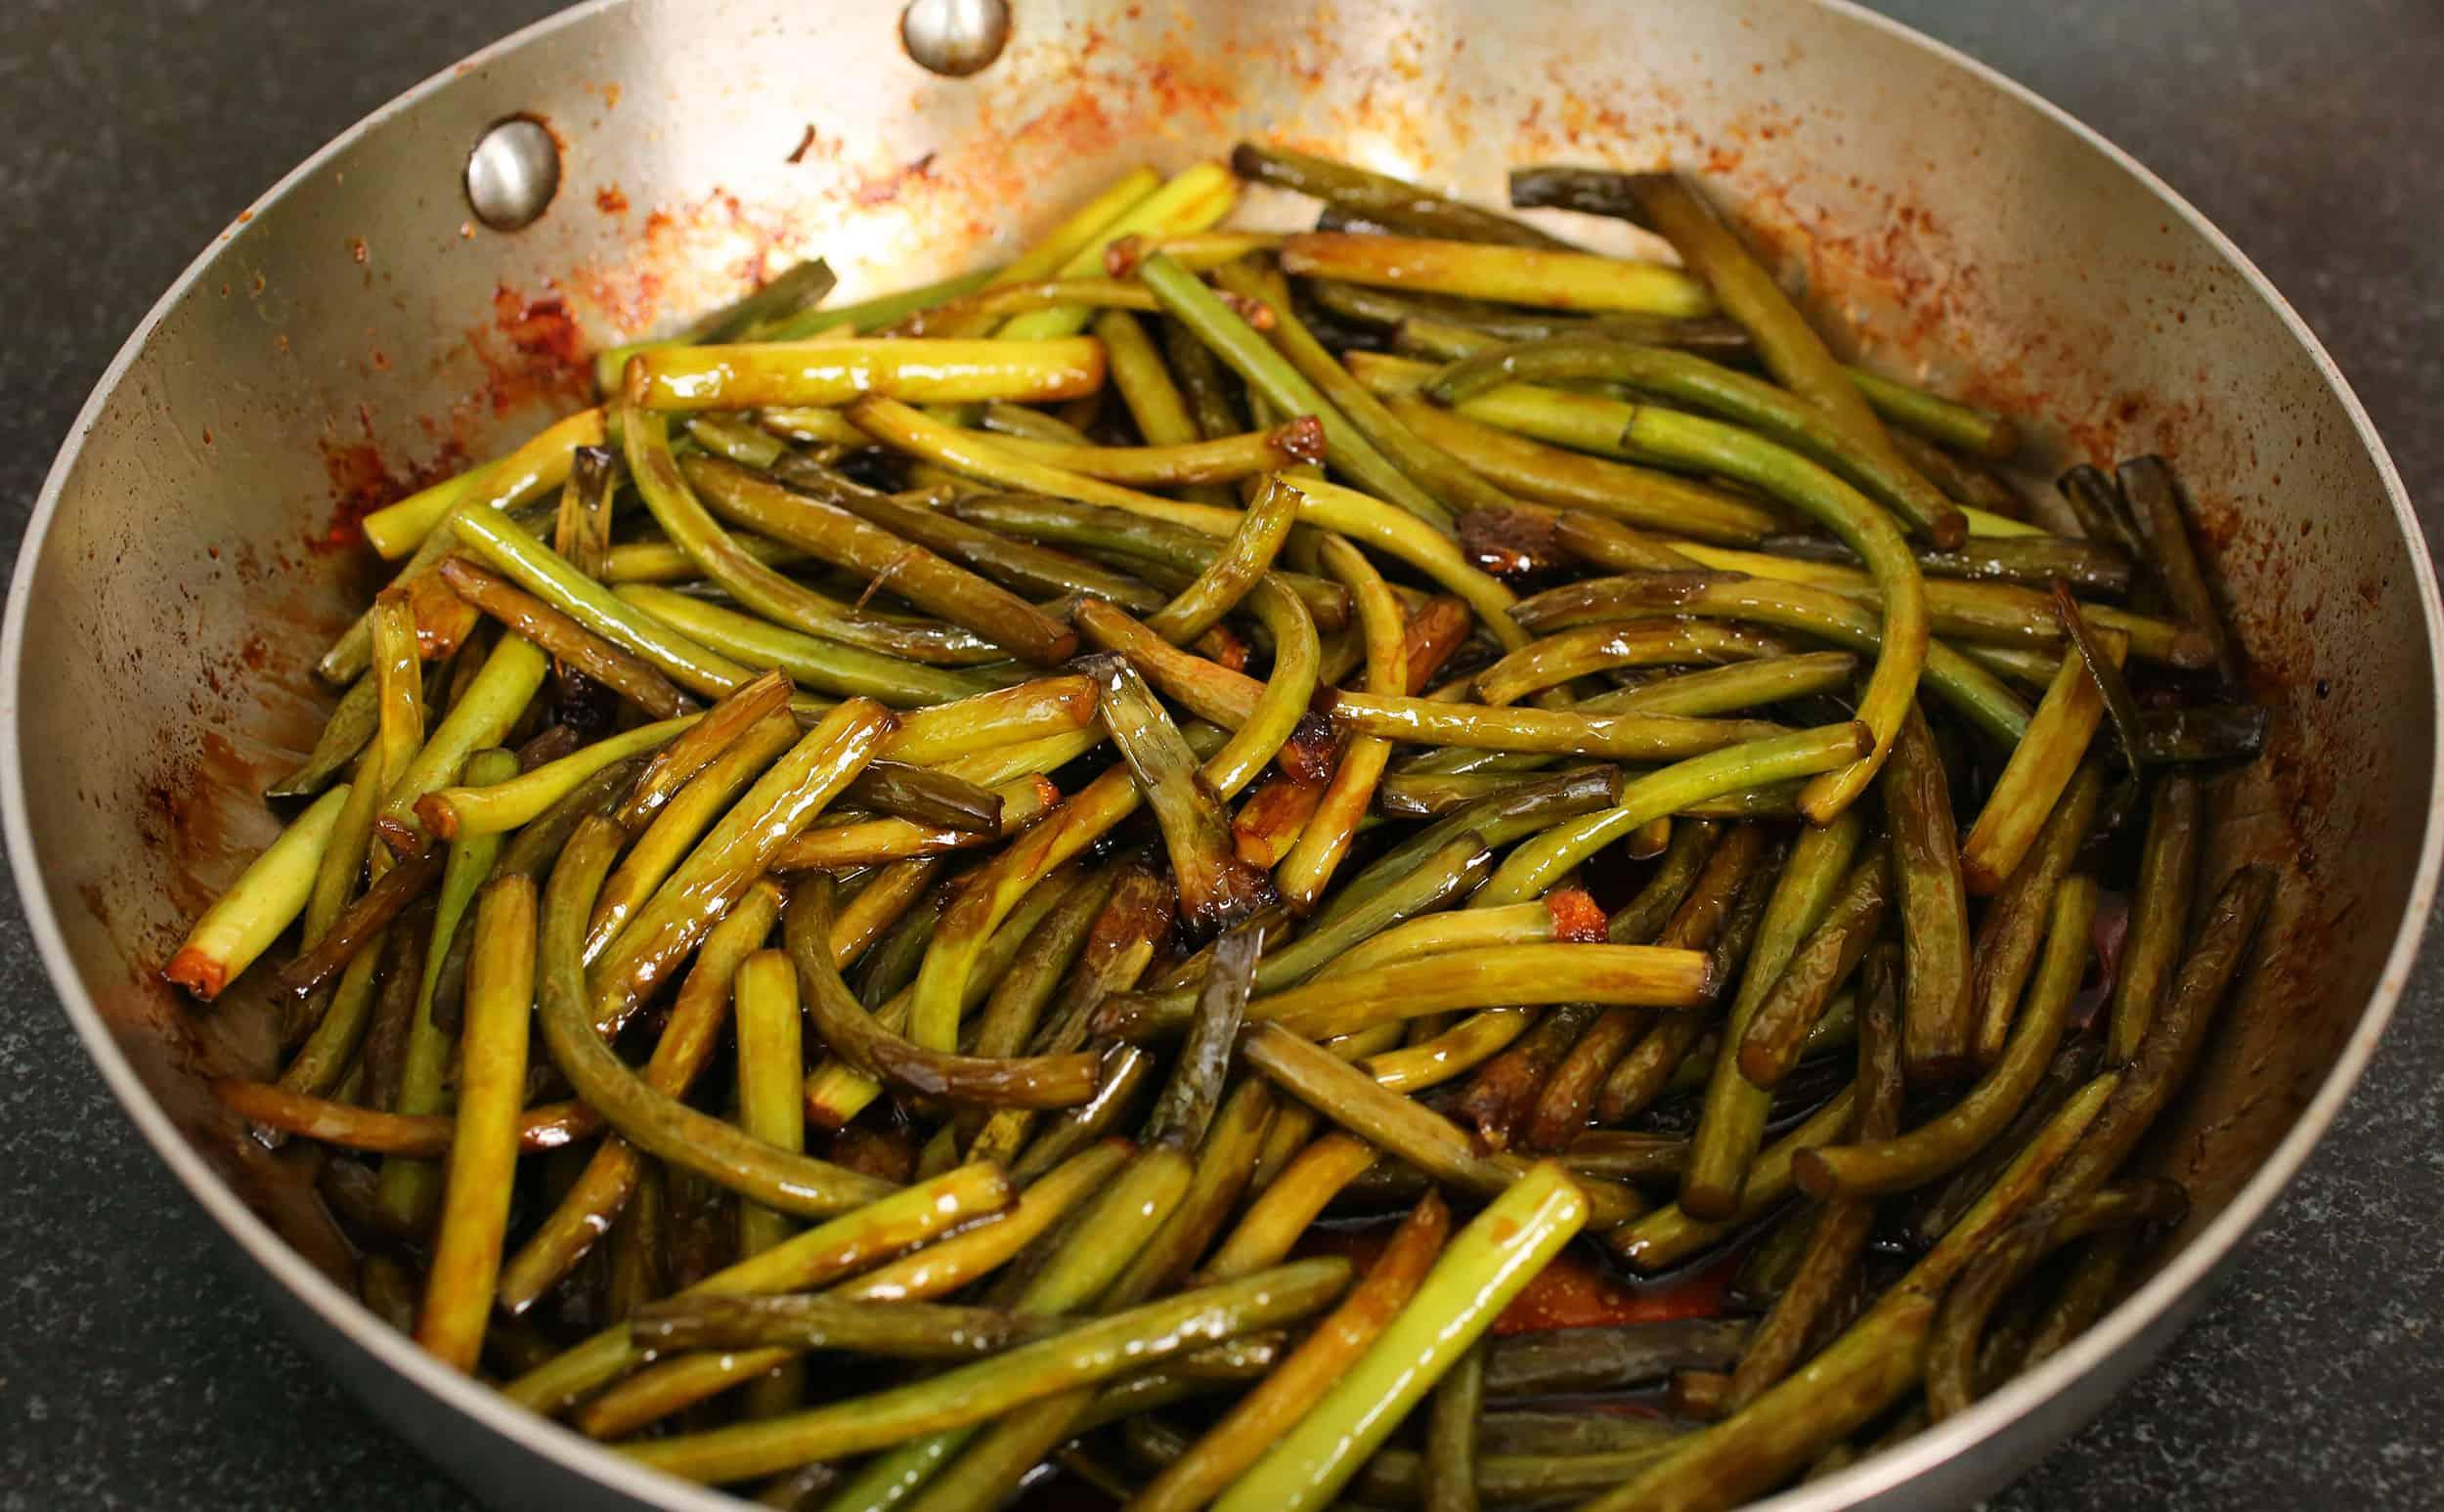 Stir-fried garlic scapes (Maneuljjong-bokkeum: 마늘쫑볶음 ...